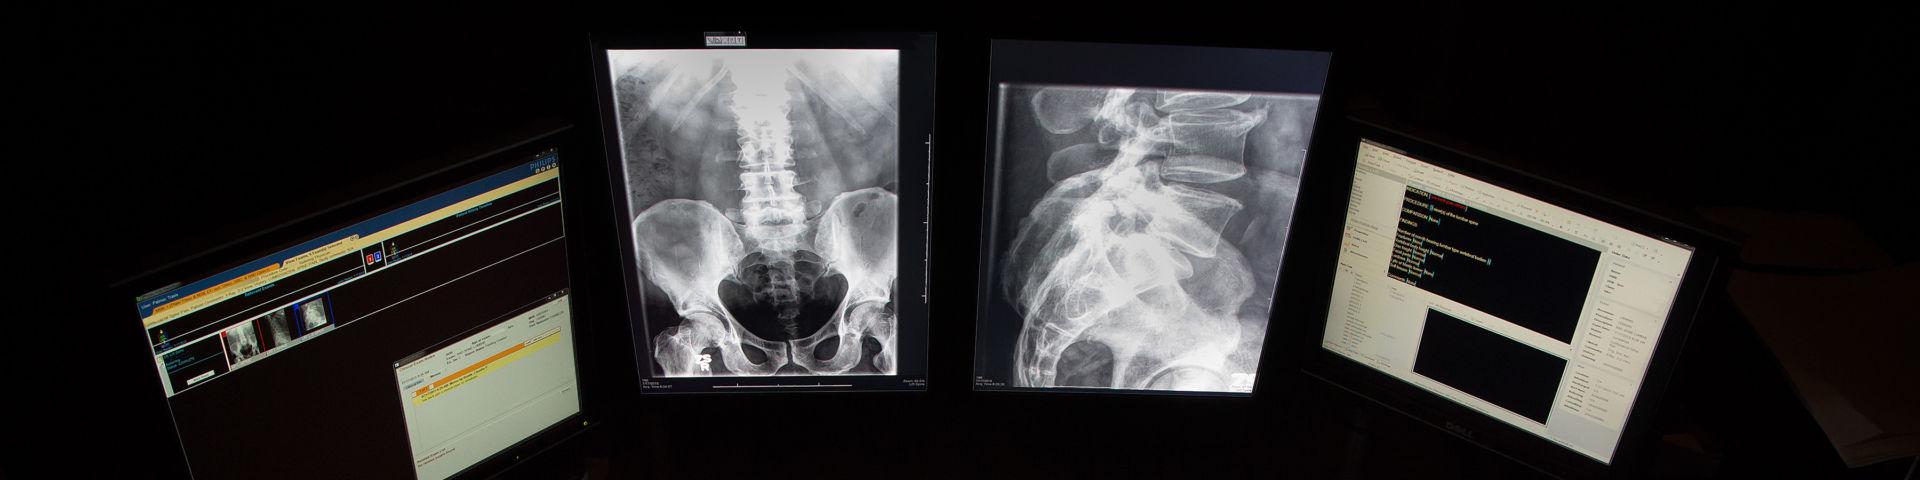 Radiology 1 2021 02 17 171808